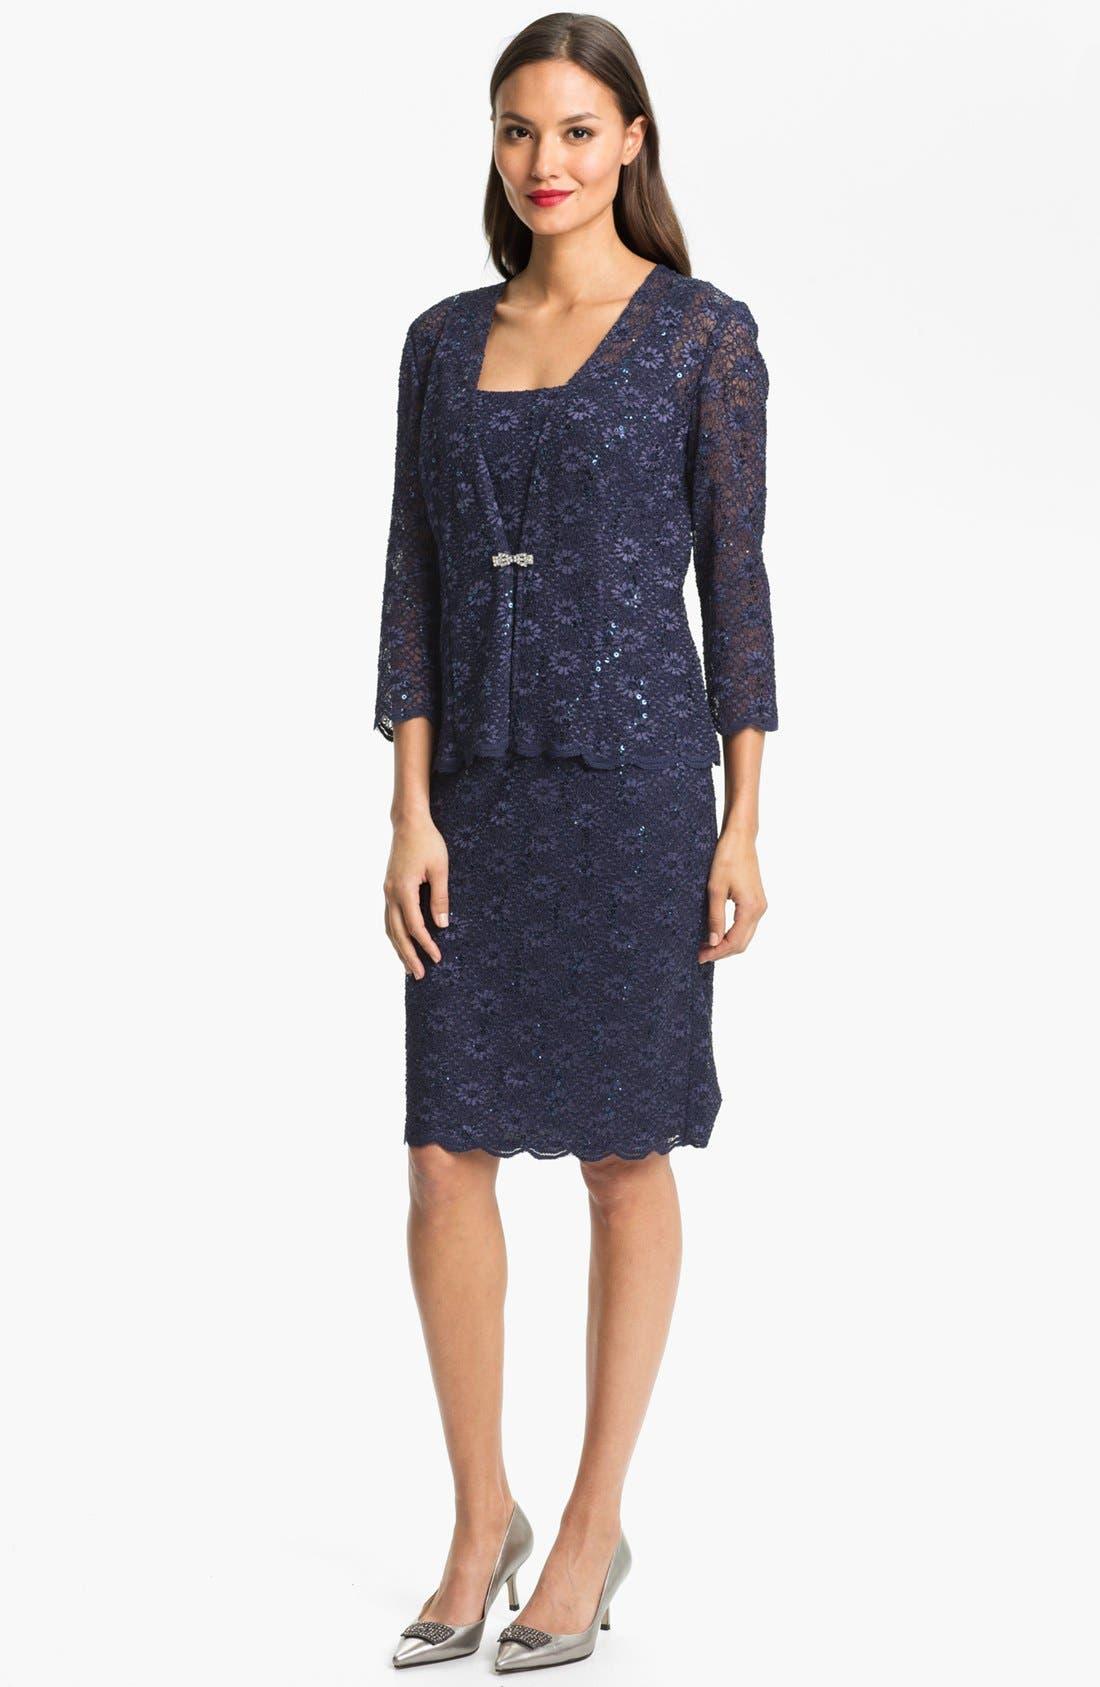 Alternate Image 1 Selected - Alex Evenings Embellished Lace Dress & Jacket (Petite)